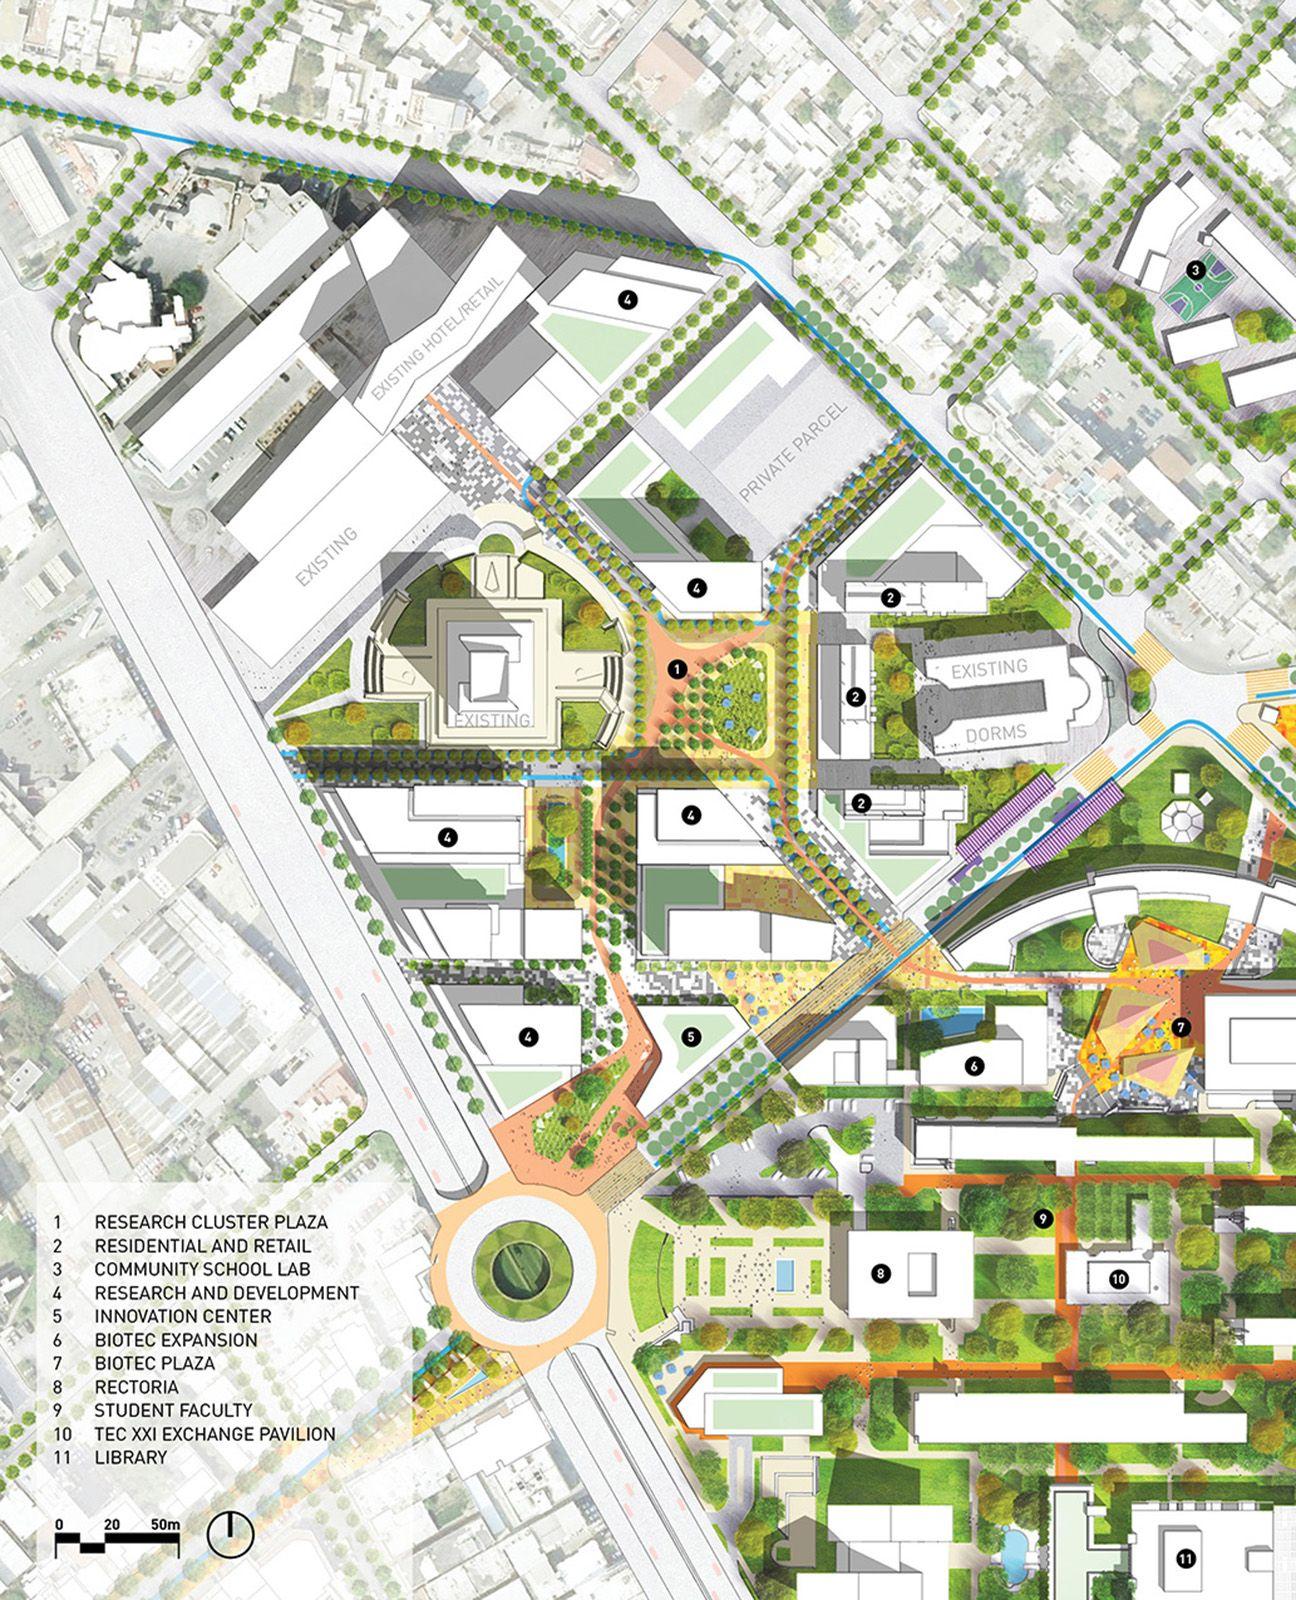 Sasaki Associates Regeneracion A Vision For The Campus And District Urban Design Plan Urban Design Concept Urban Design Graphics